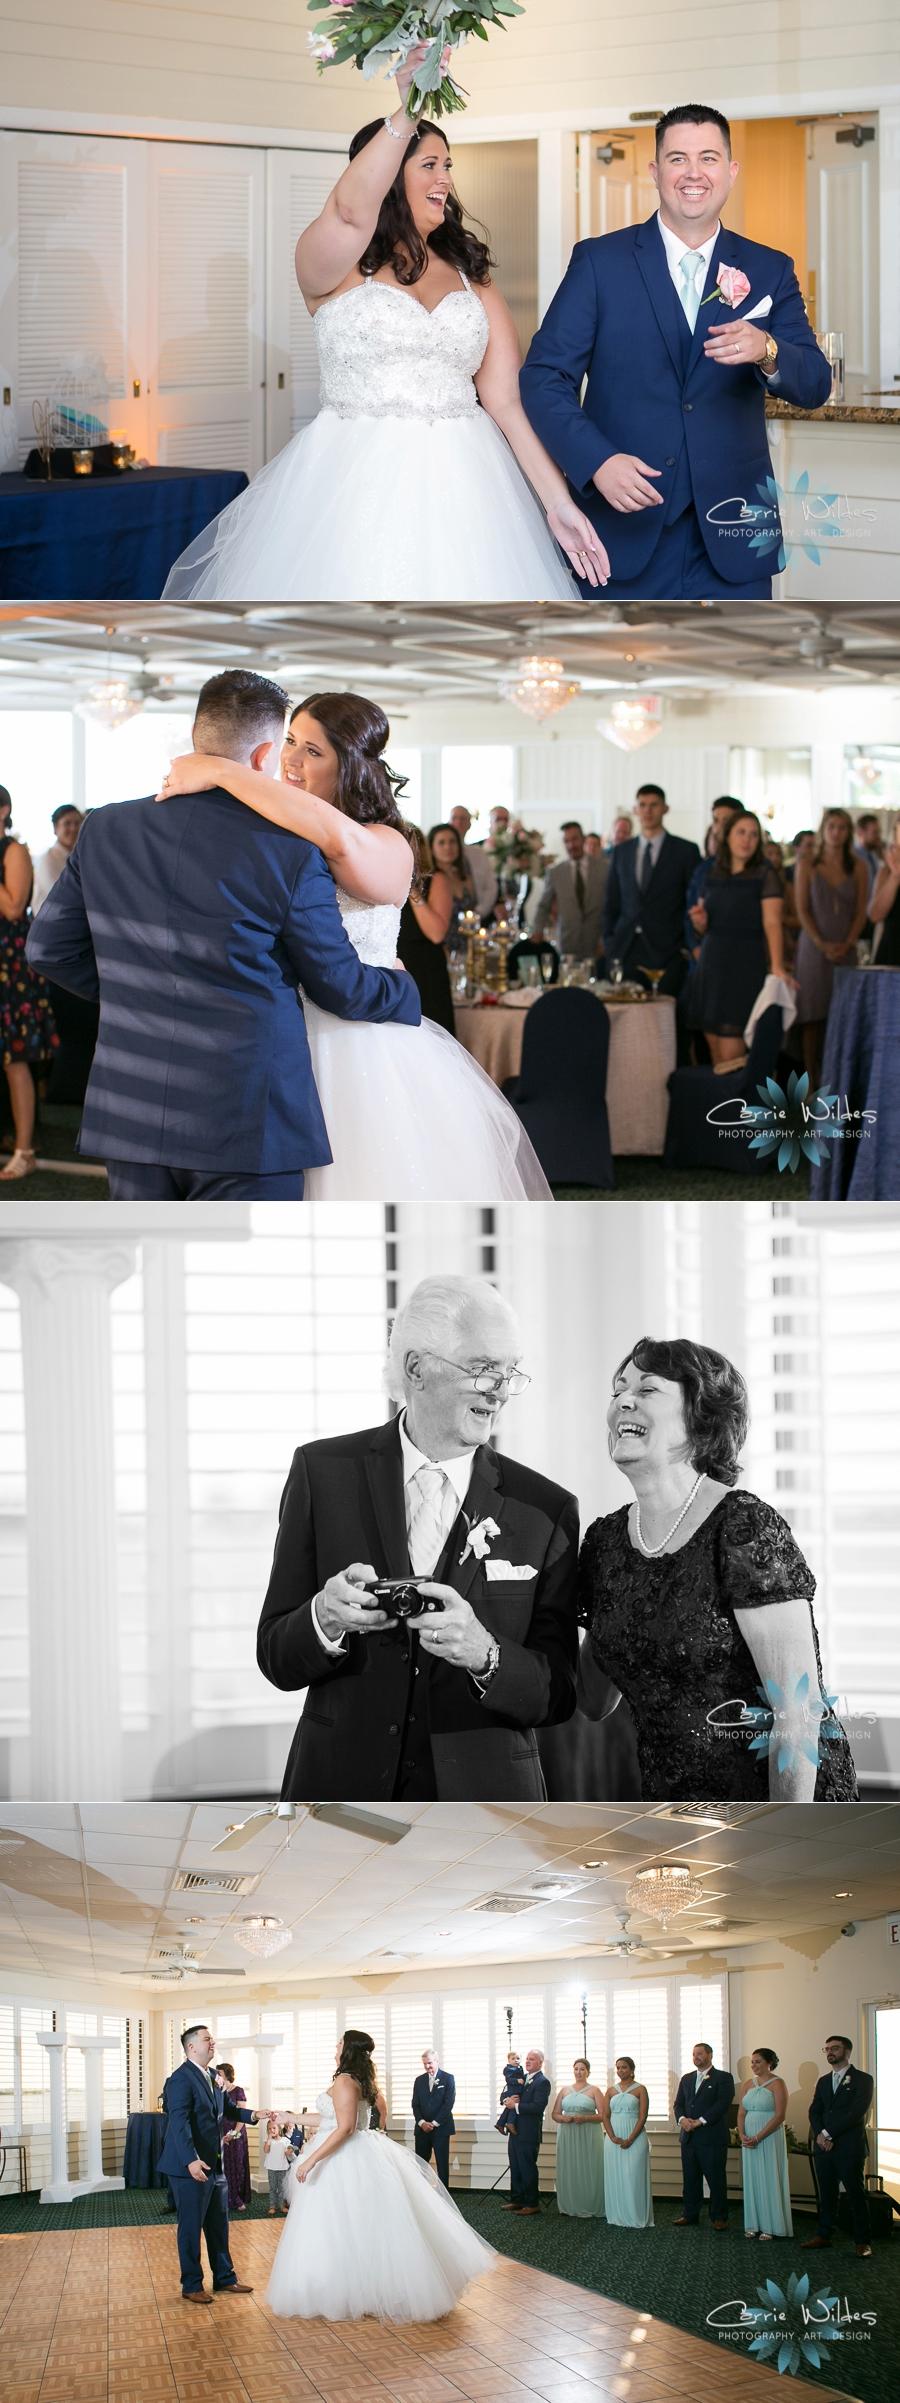 8_4_18 Charlie and Julie Bon Apetit Dunedin Wedding_0038.jpg